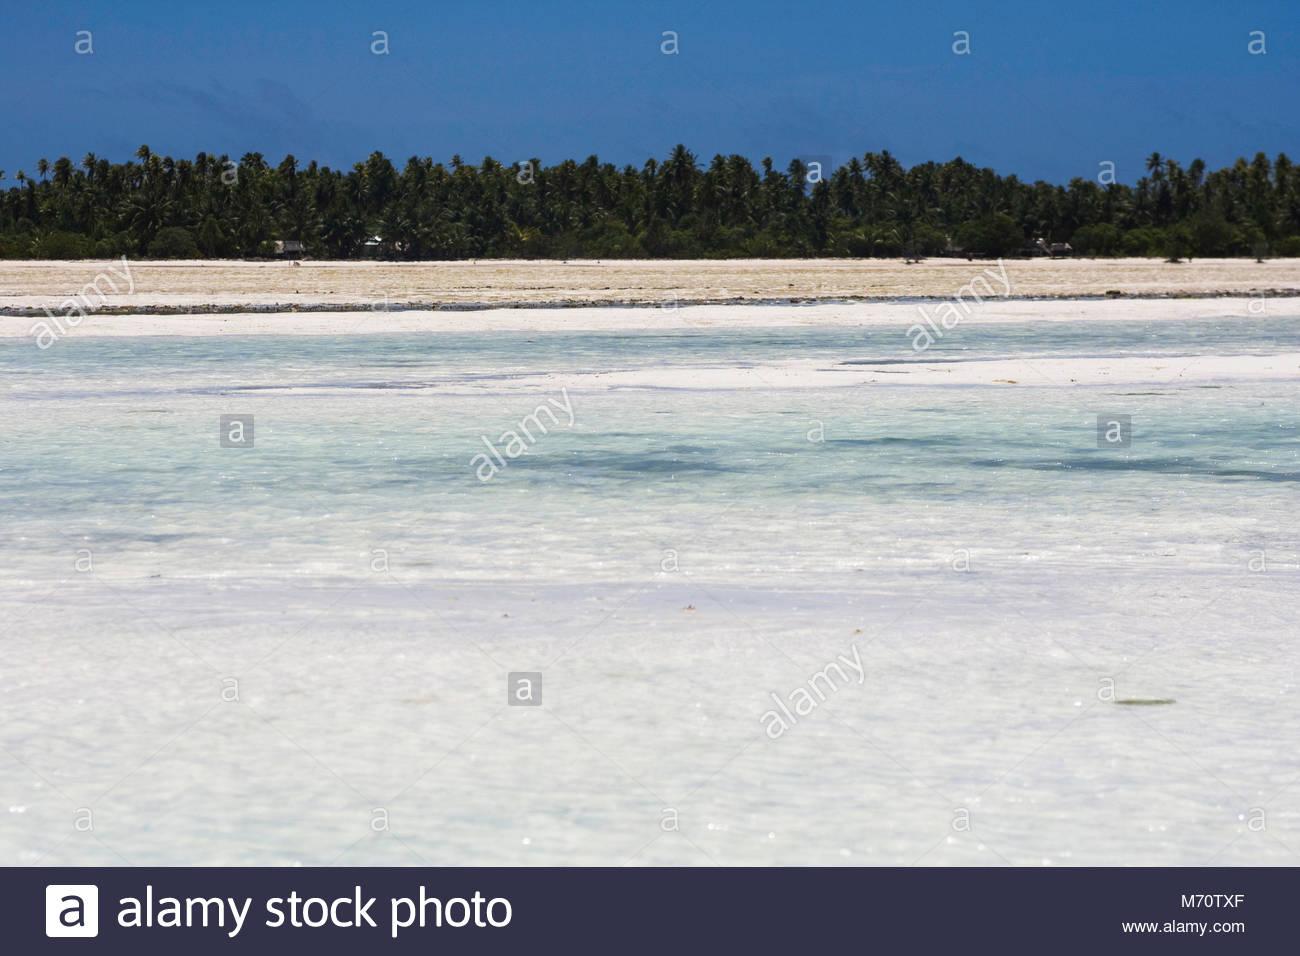 Tarawa beach from the lagoon - Stock Image